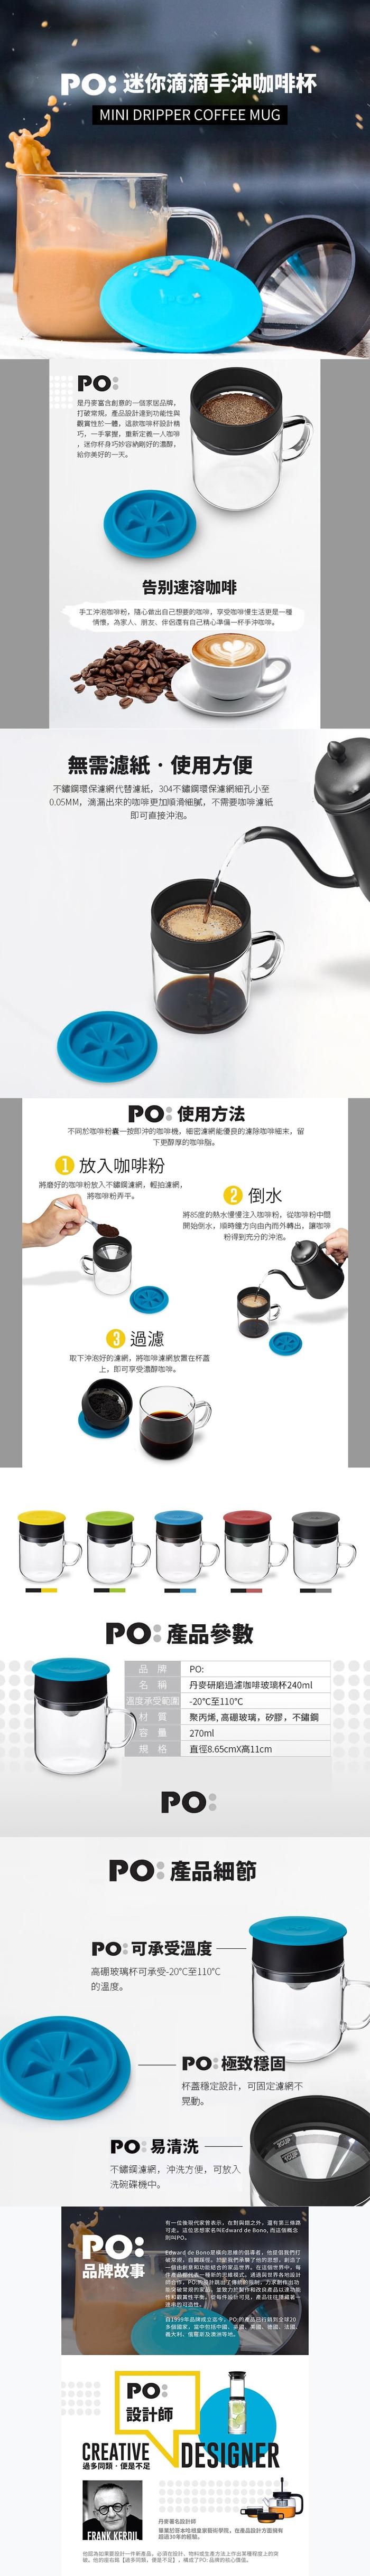 PO:Selected|丹麥DIY手沖咖啡二件組(手沖咖啡壺-灰/咖啡玻璃杯240ml-紅)